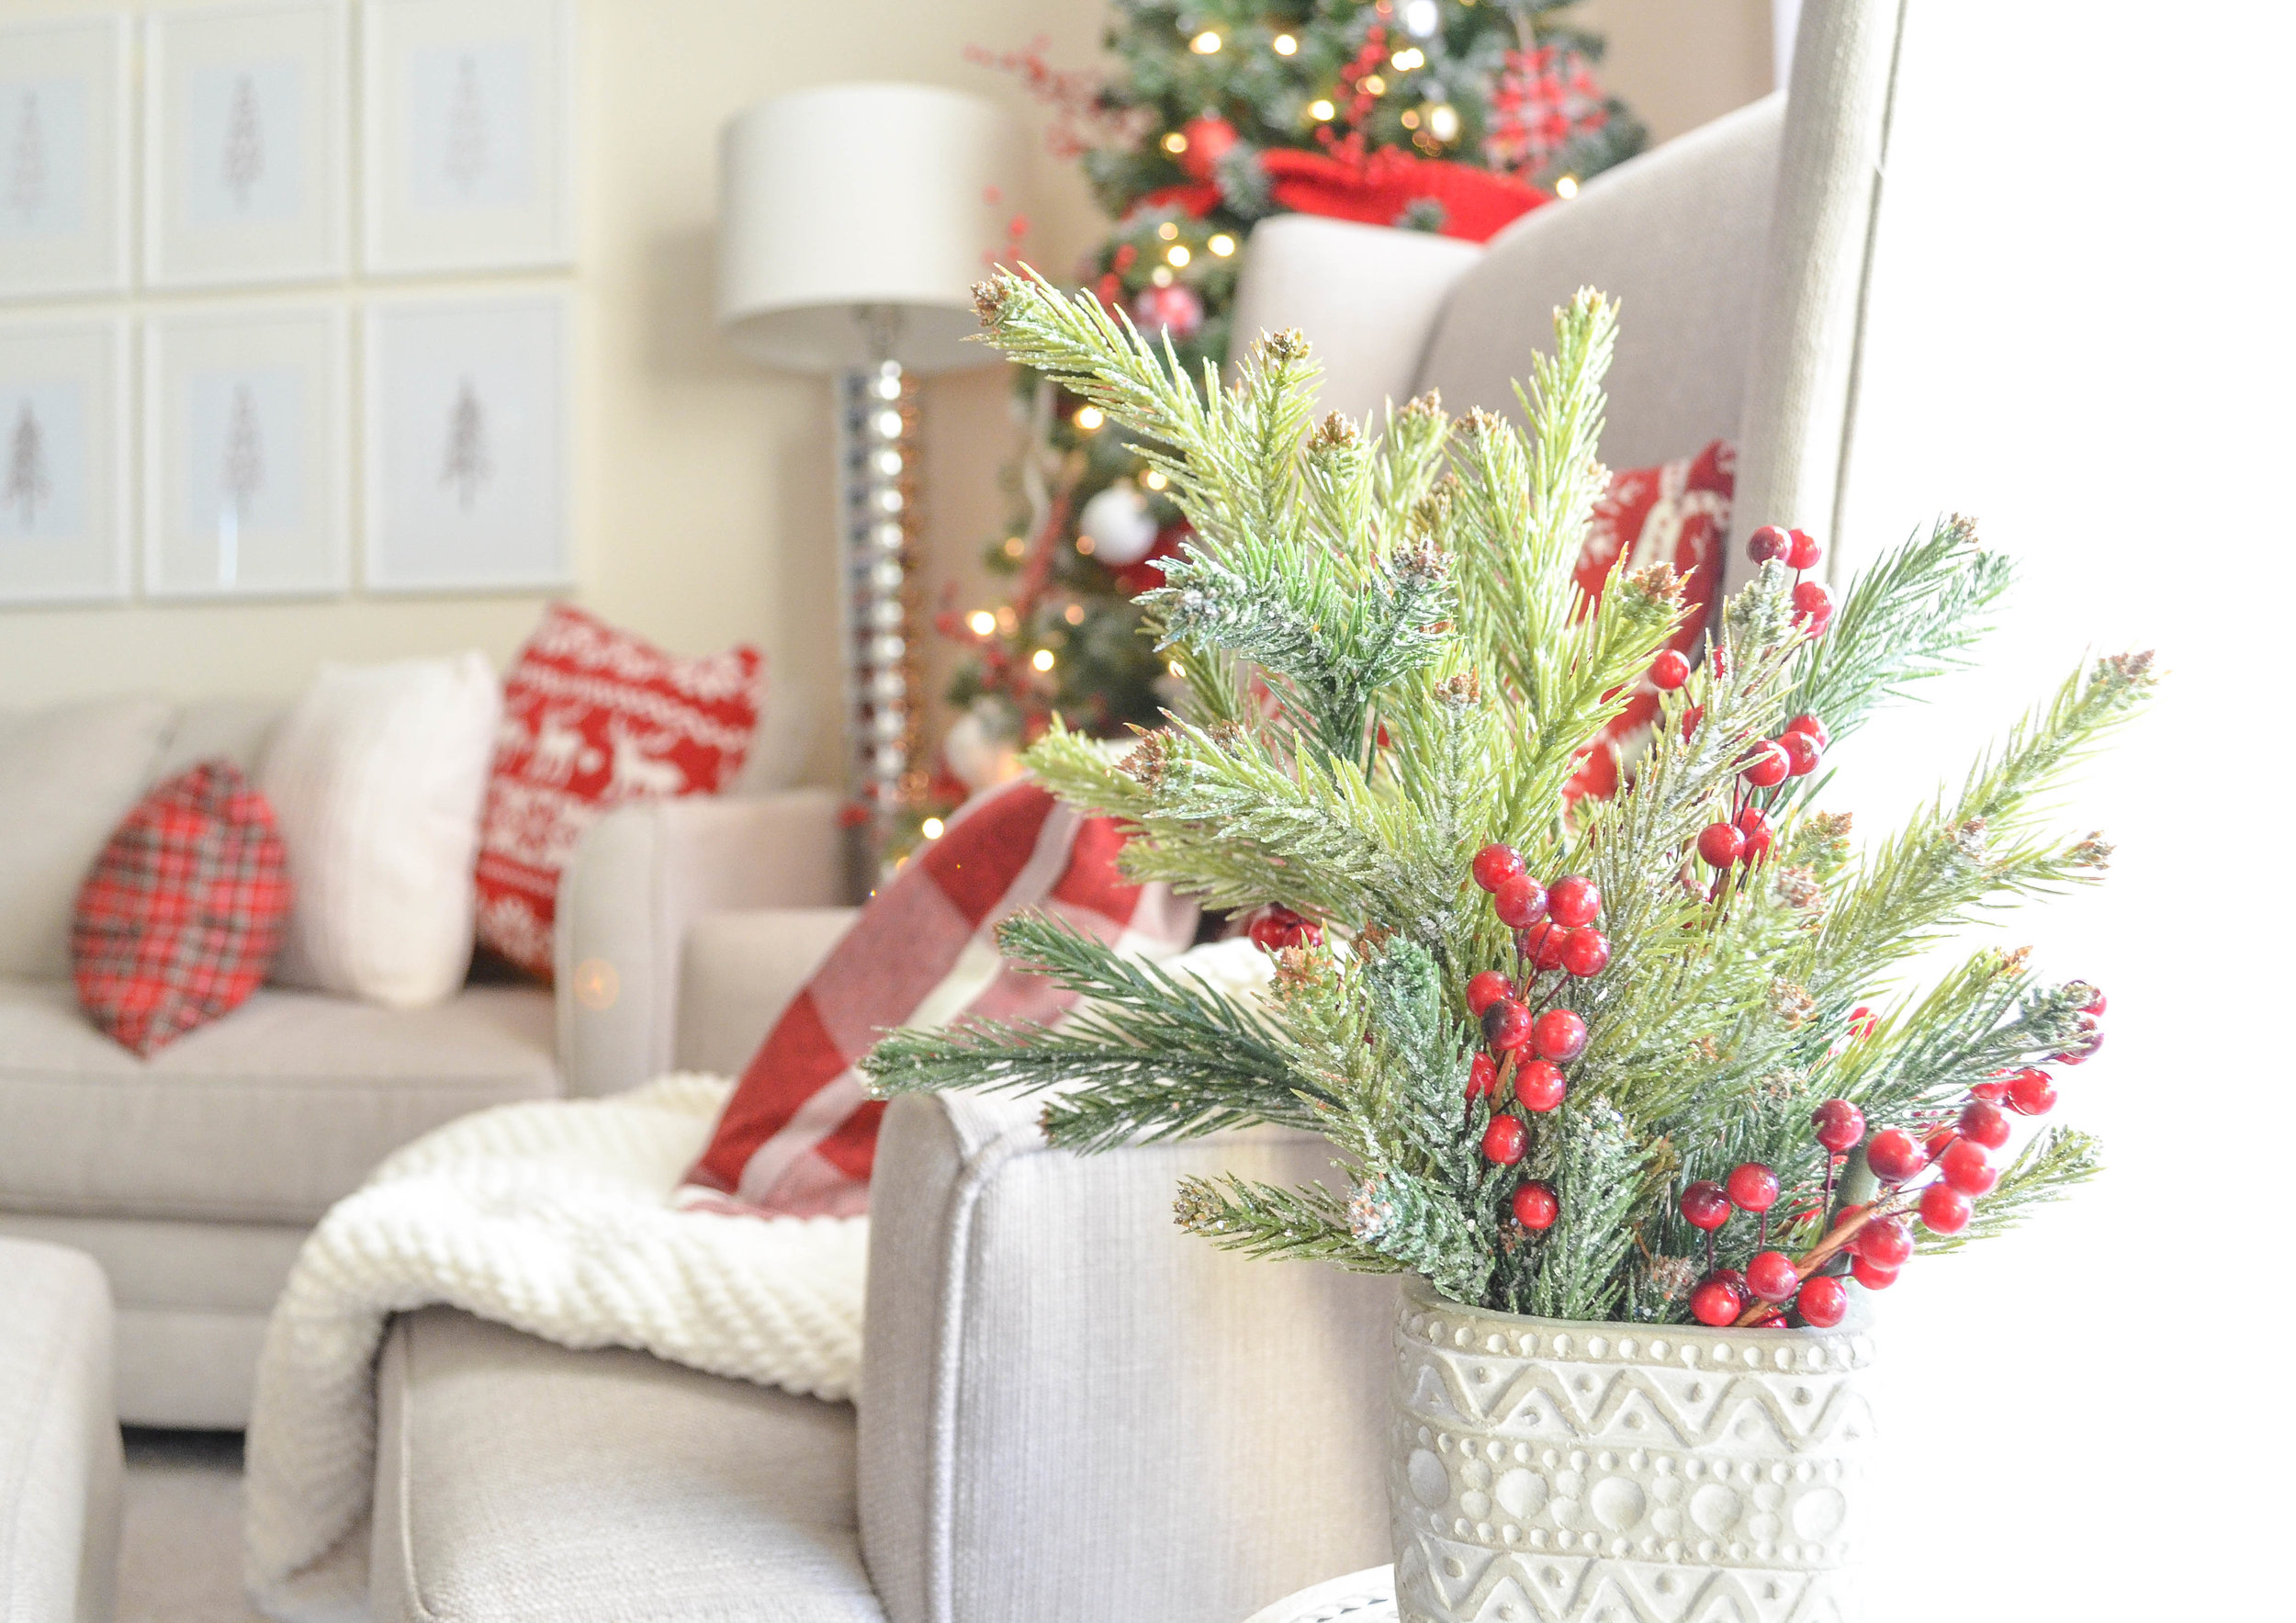 Cozy Christmas Decor-53.jpg